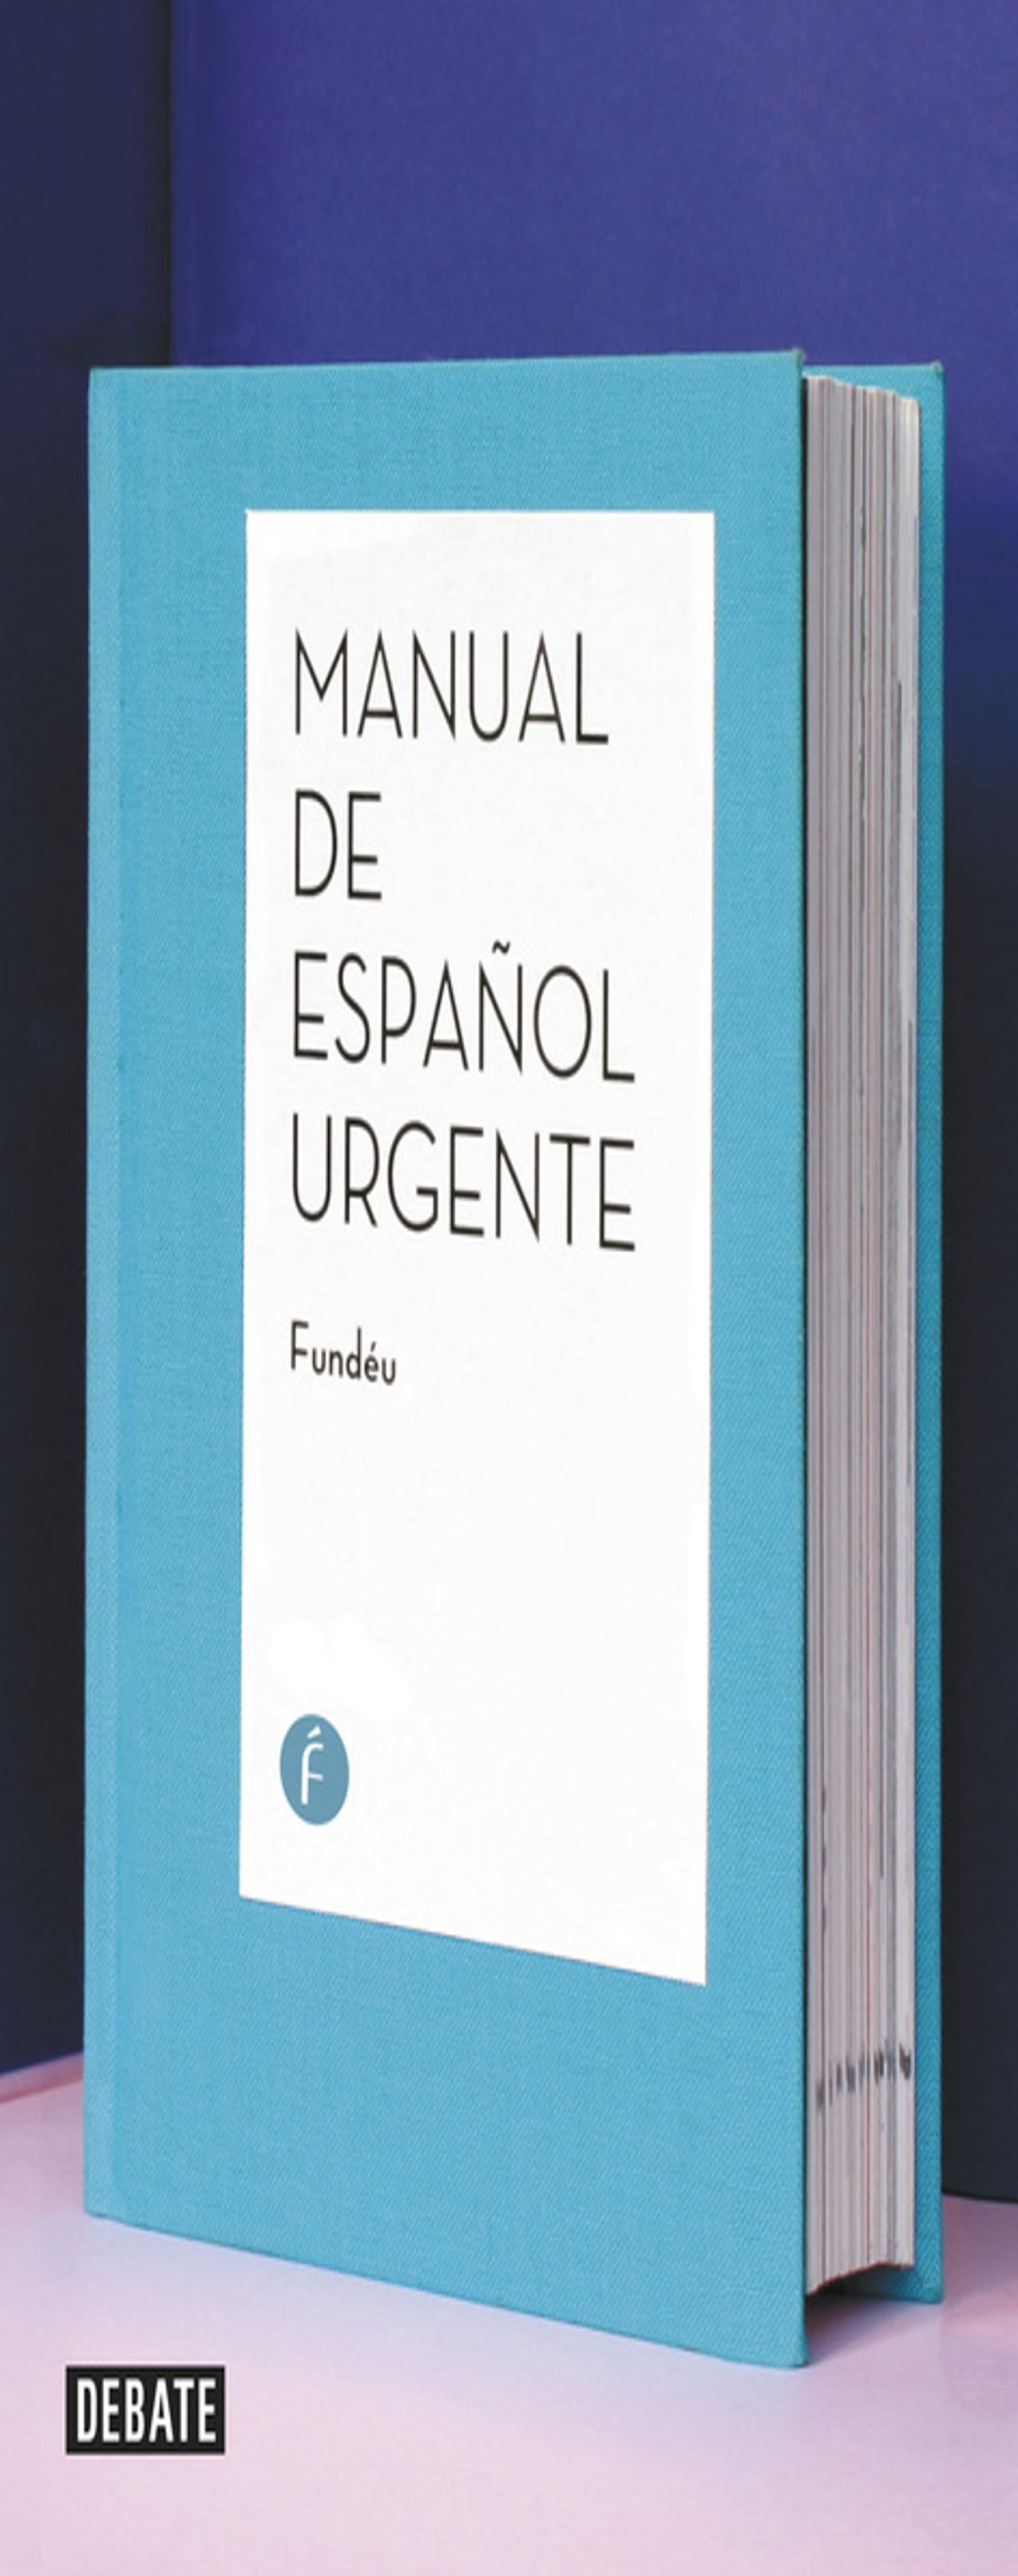 MANUAL DE ESPAÑOL URGENTE - Fundéu